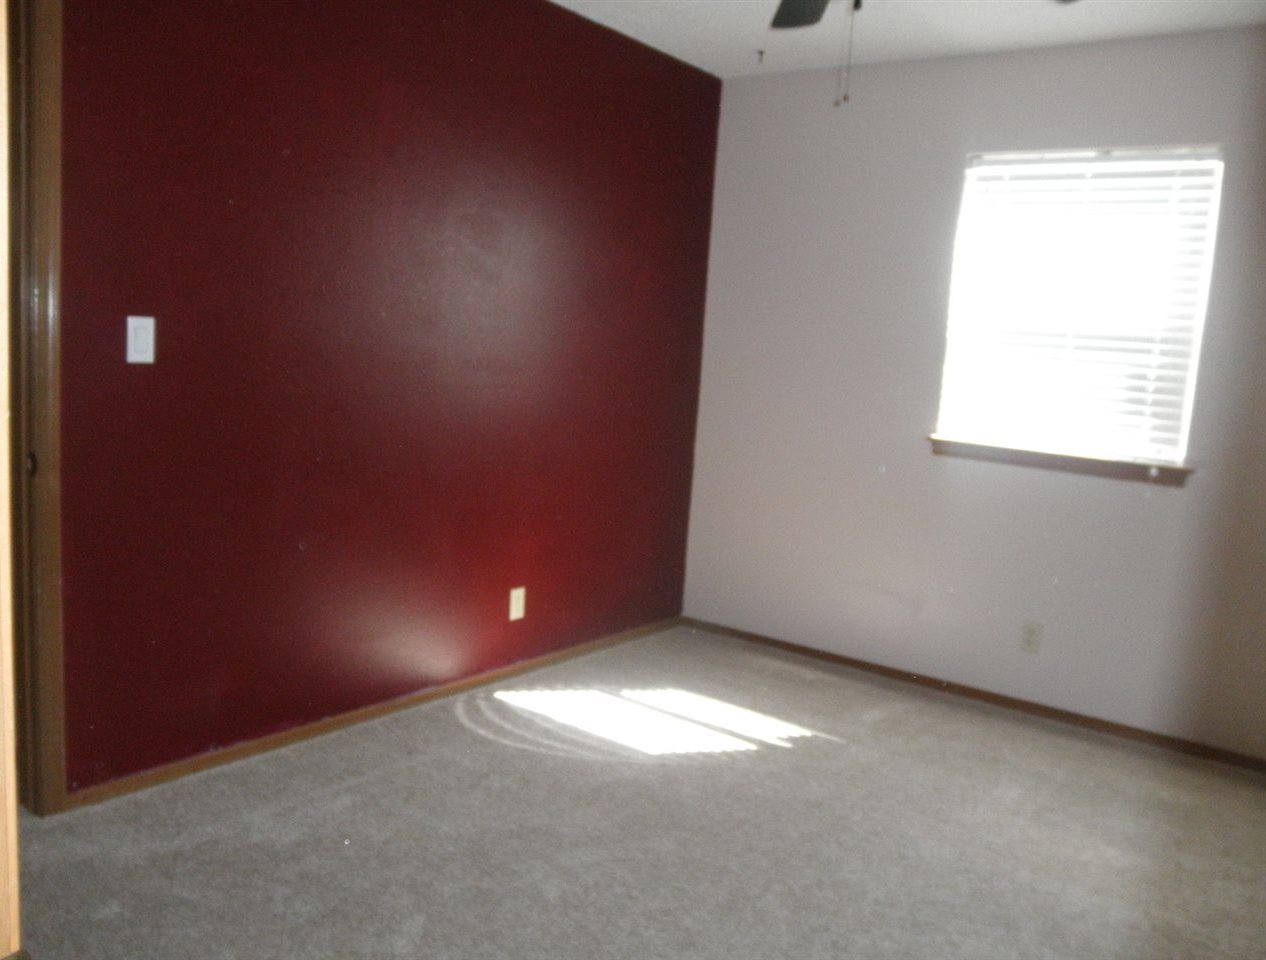 Sold Cross Sale W/ MLS | 300 Lora Ponca City, OK 74601 12